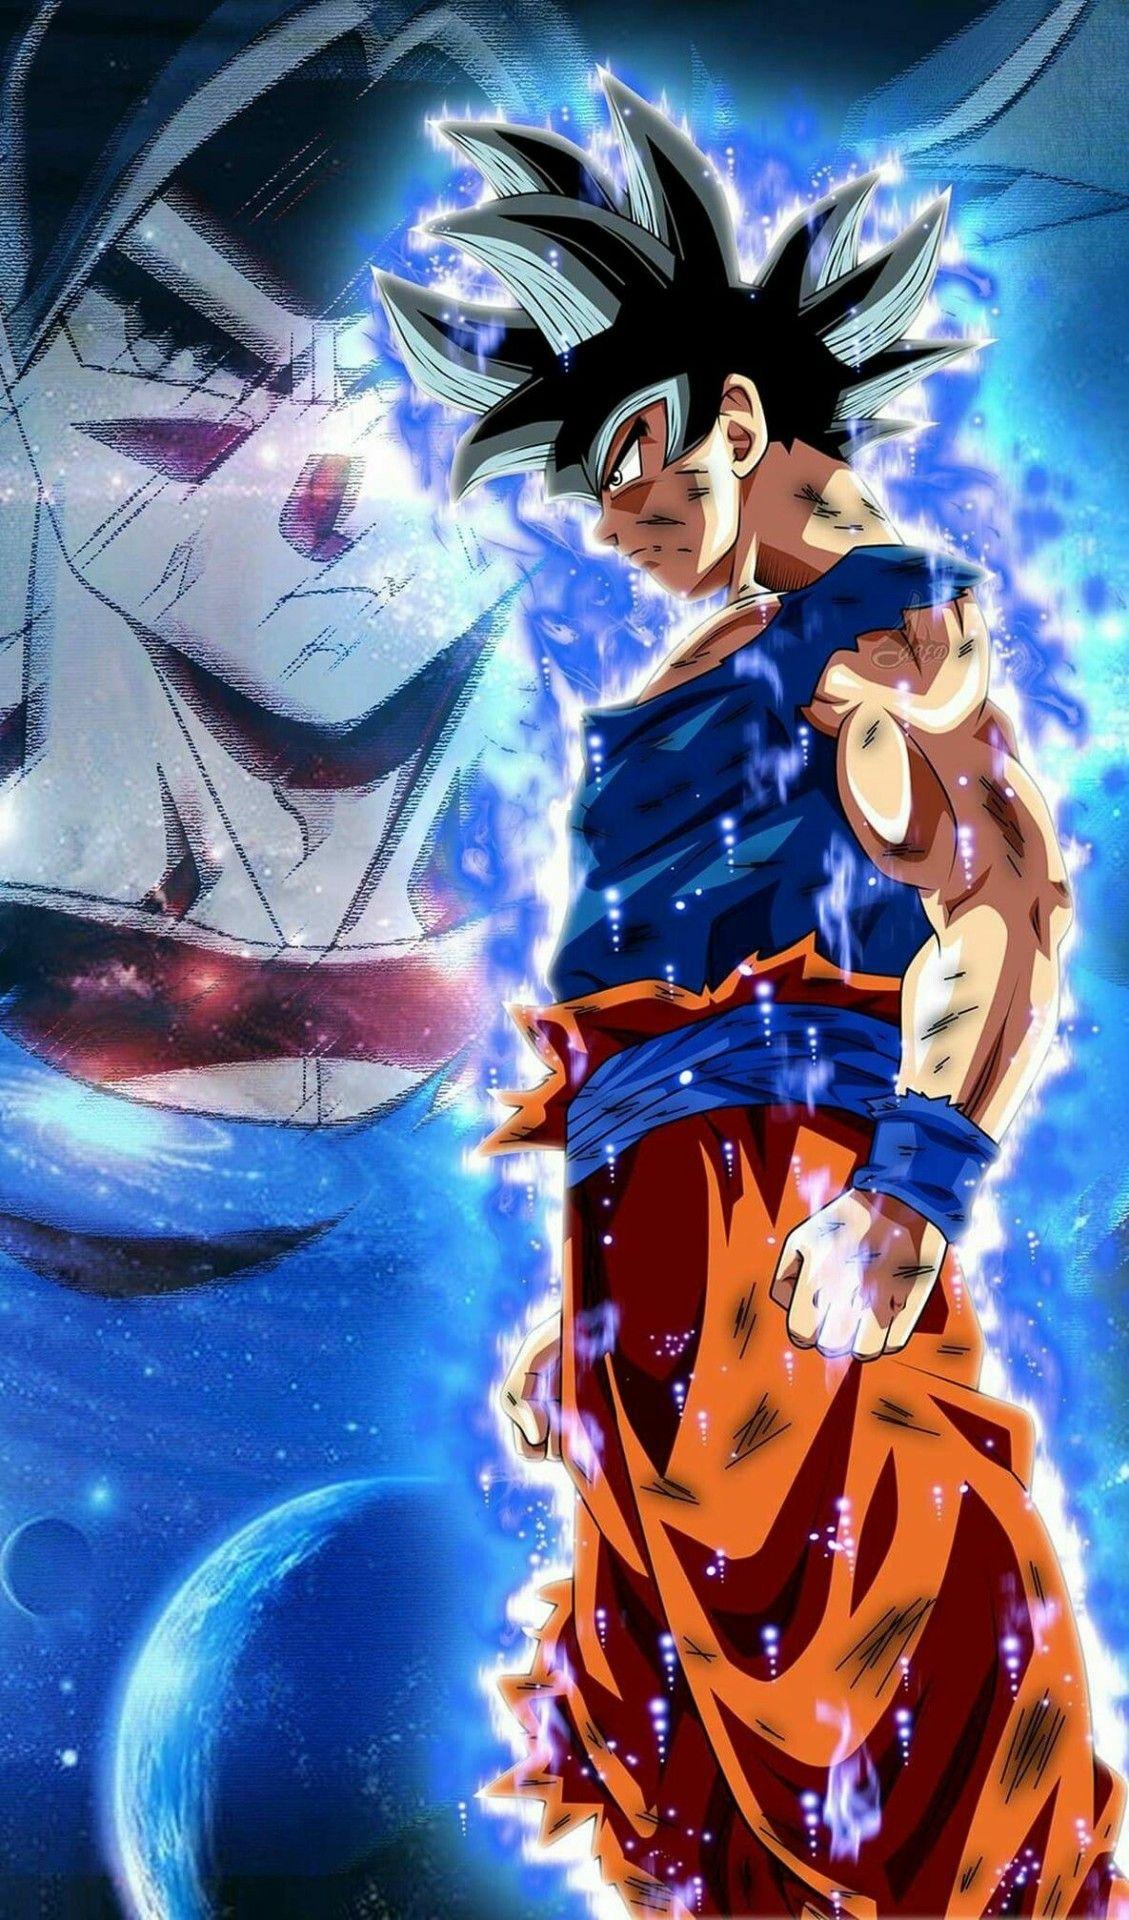 Dragon Ball Super Dbs Fan Art Goku Migatte No Gokui Ultra Instinct Anime Dragon Ball Super Dragon Ball Wallpapers Dragon Ball